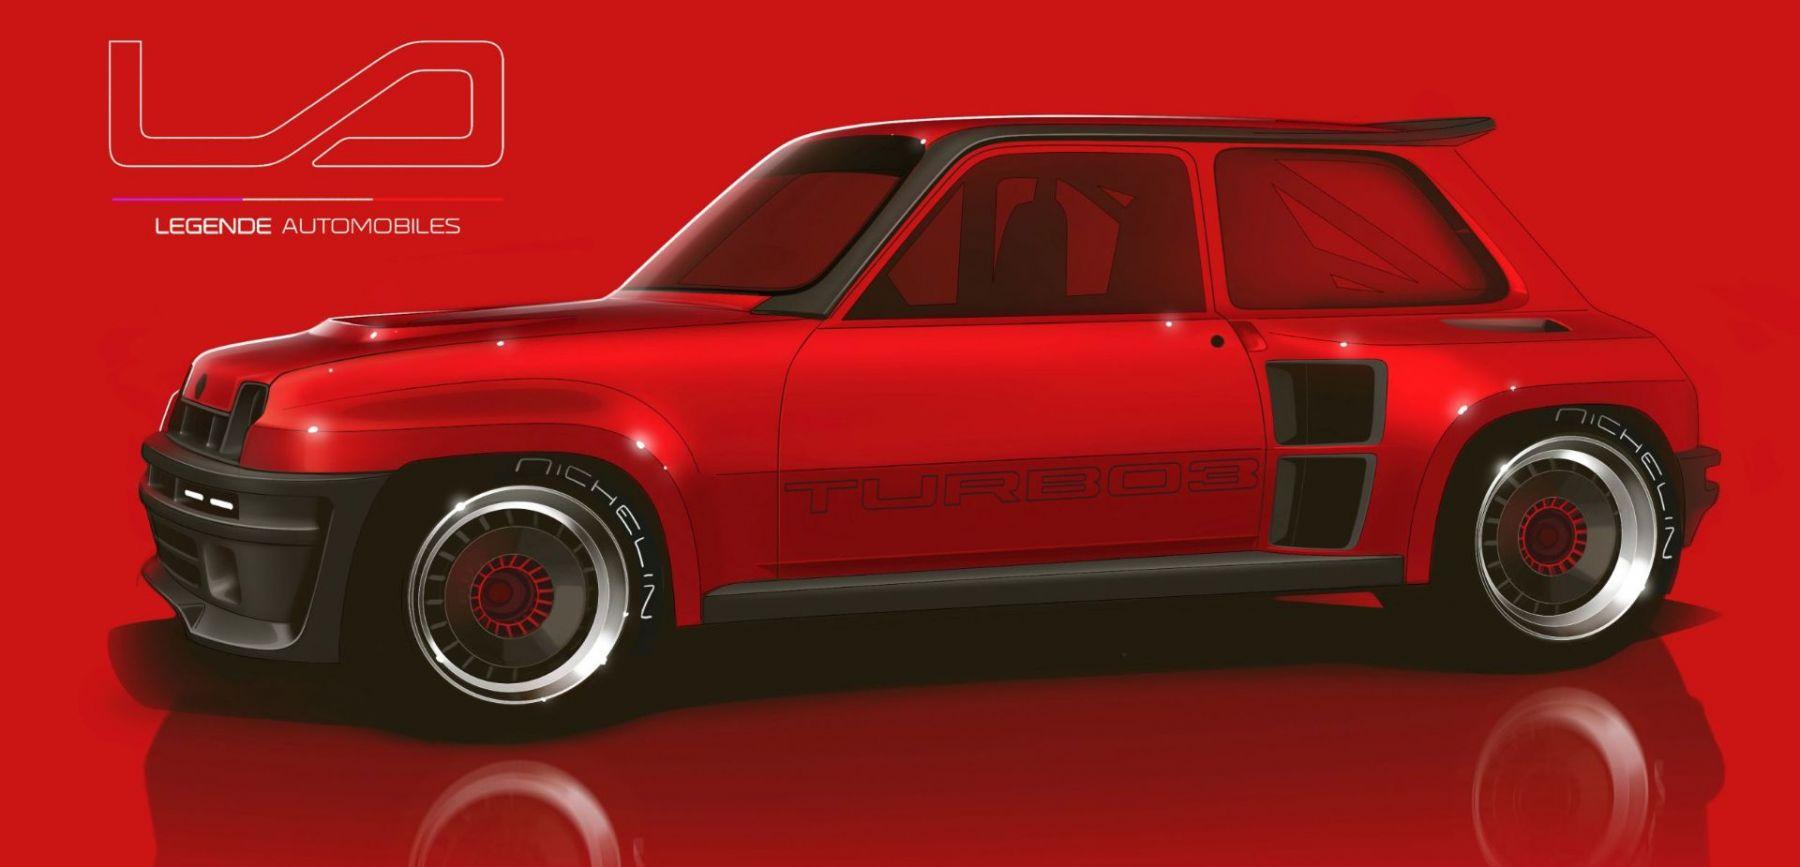 Renault 5 Turbo 3 - Legende Automobiles